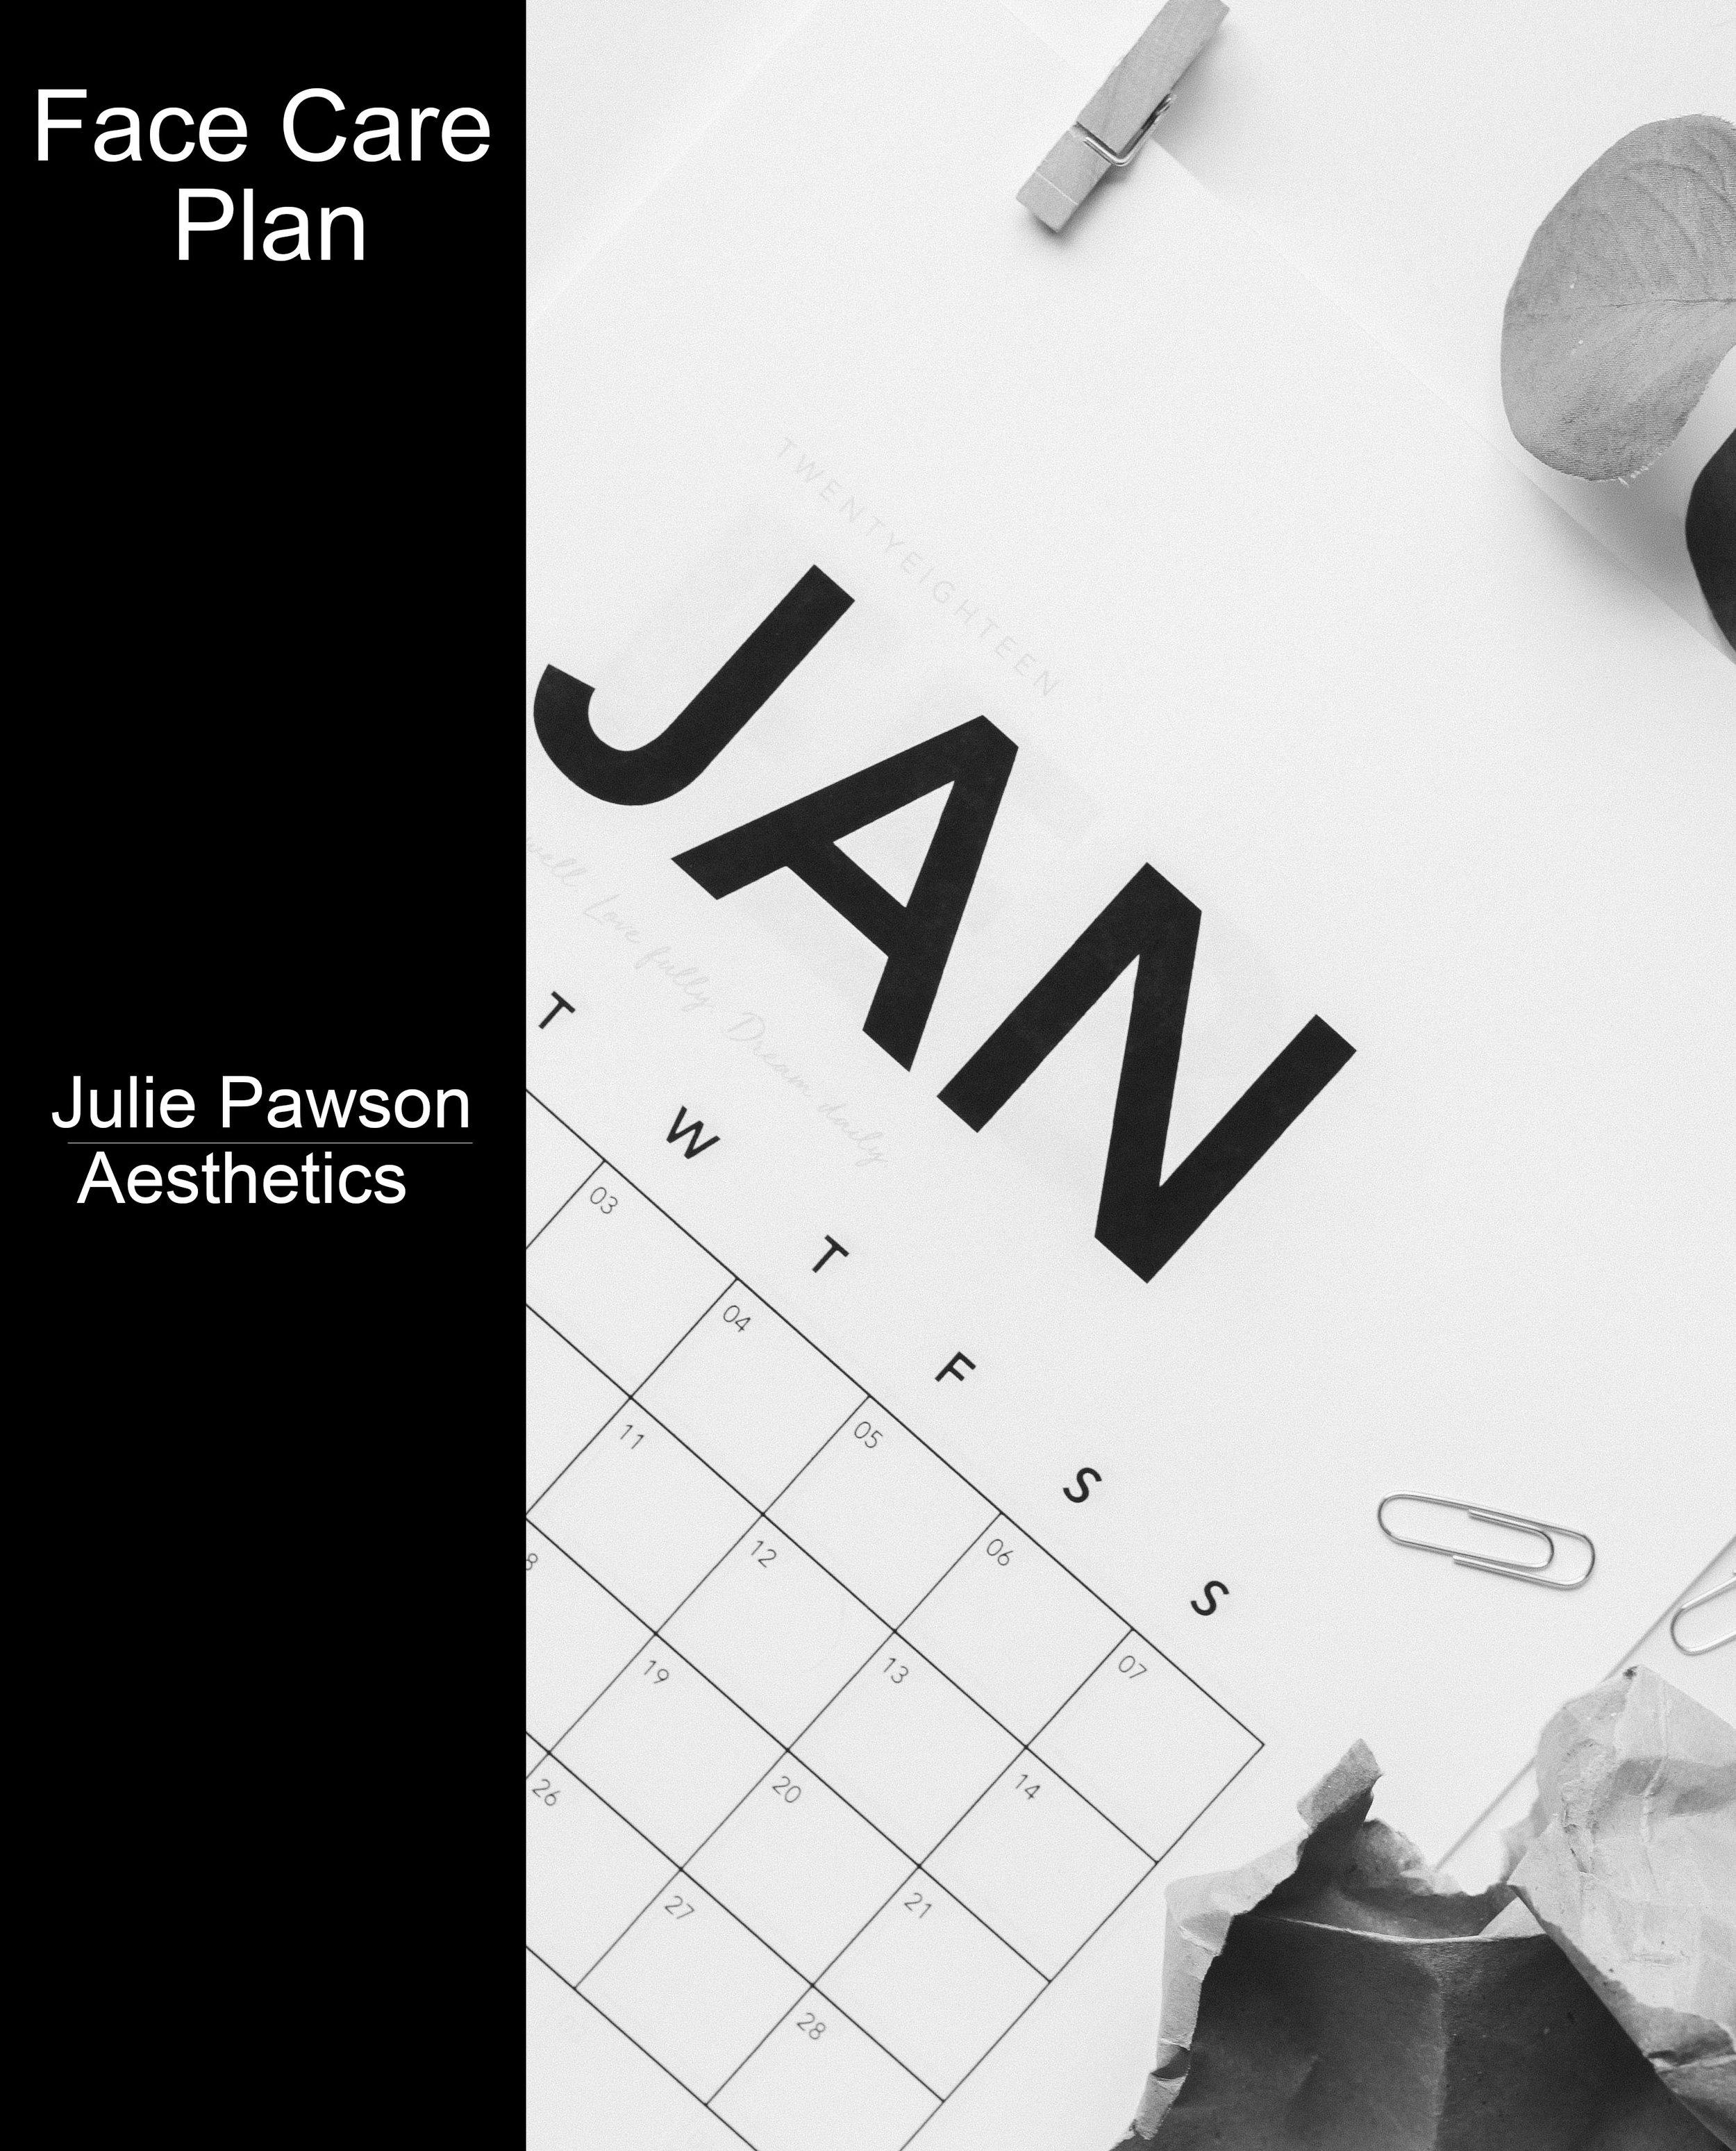 face care plan copy.jpg